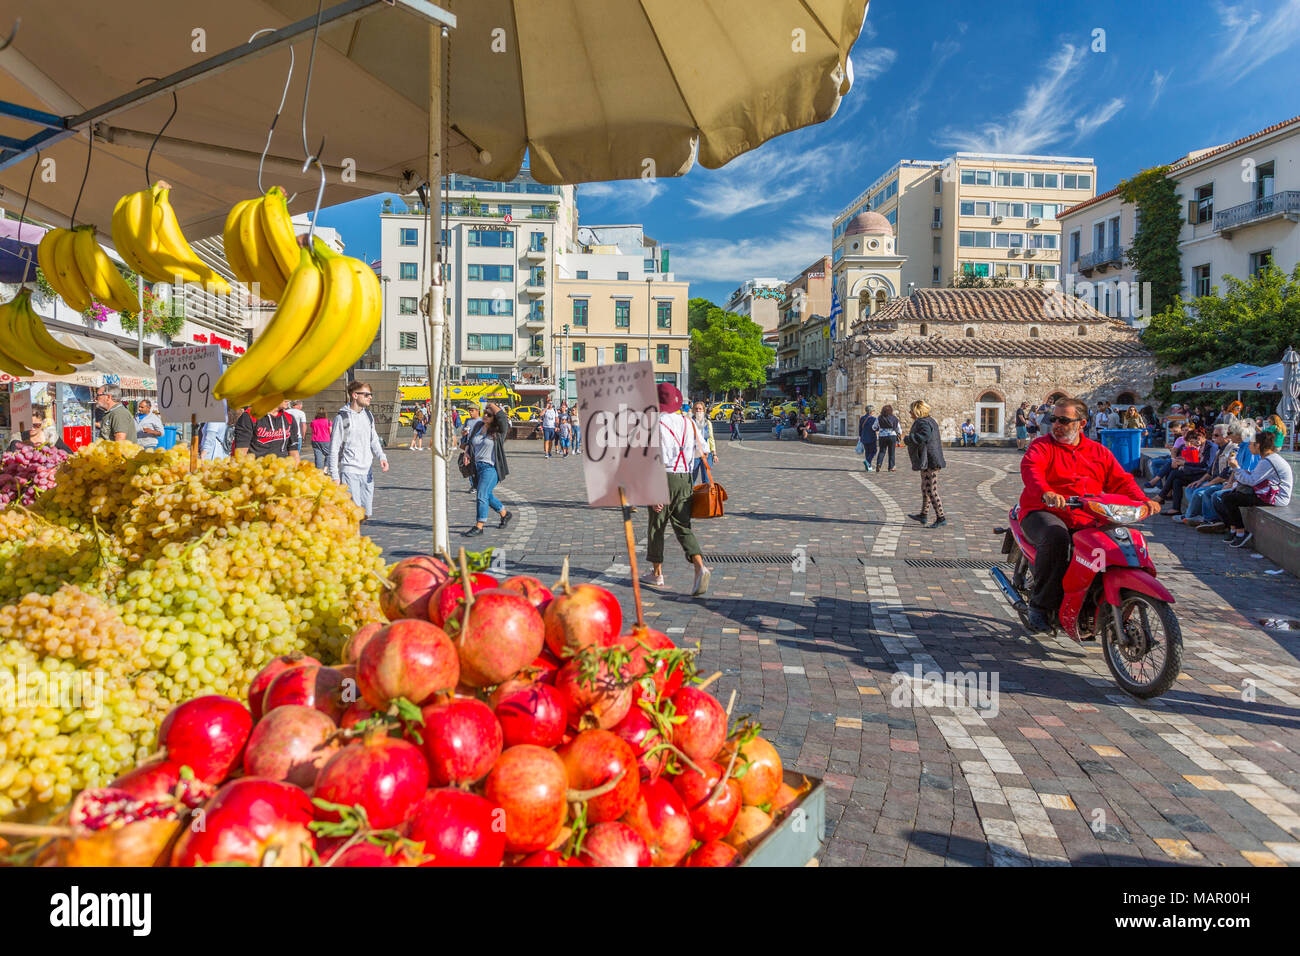 View of fruit stall and Greek Orthodox Church in Monastiraki Square, Monastiraki District, Athens, Greece, Europe - Stock Image